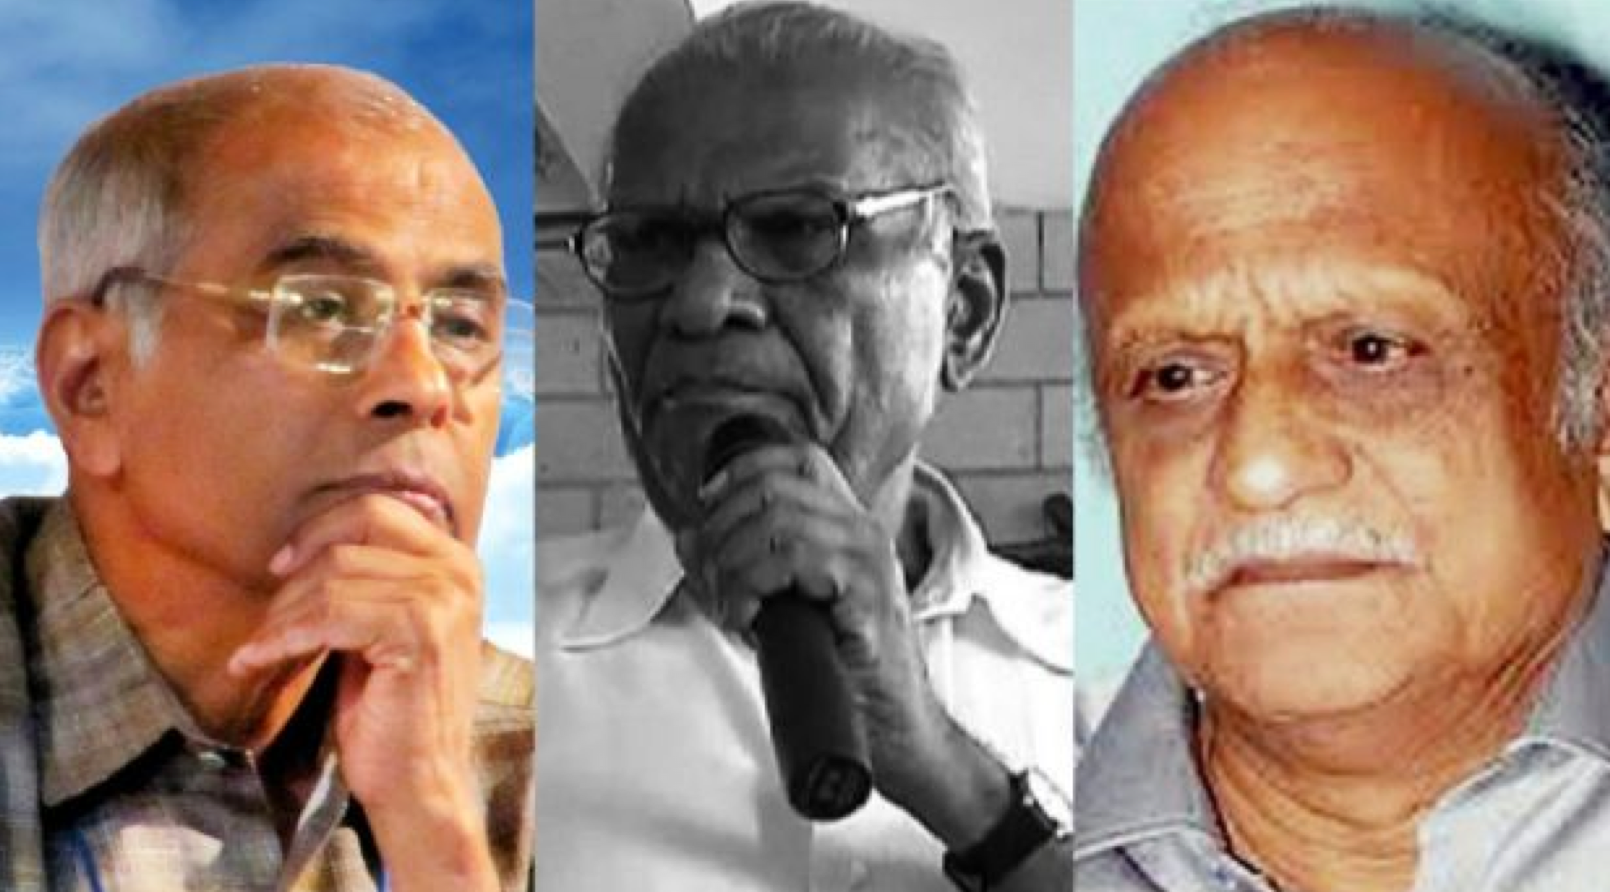 Narendra Dabholkar, Govind Pansare and M. M. Kalburgi